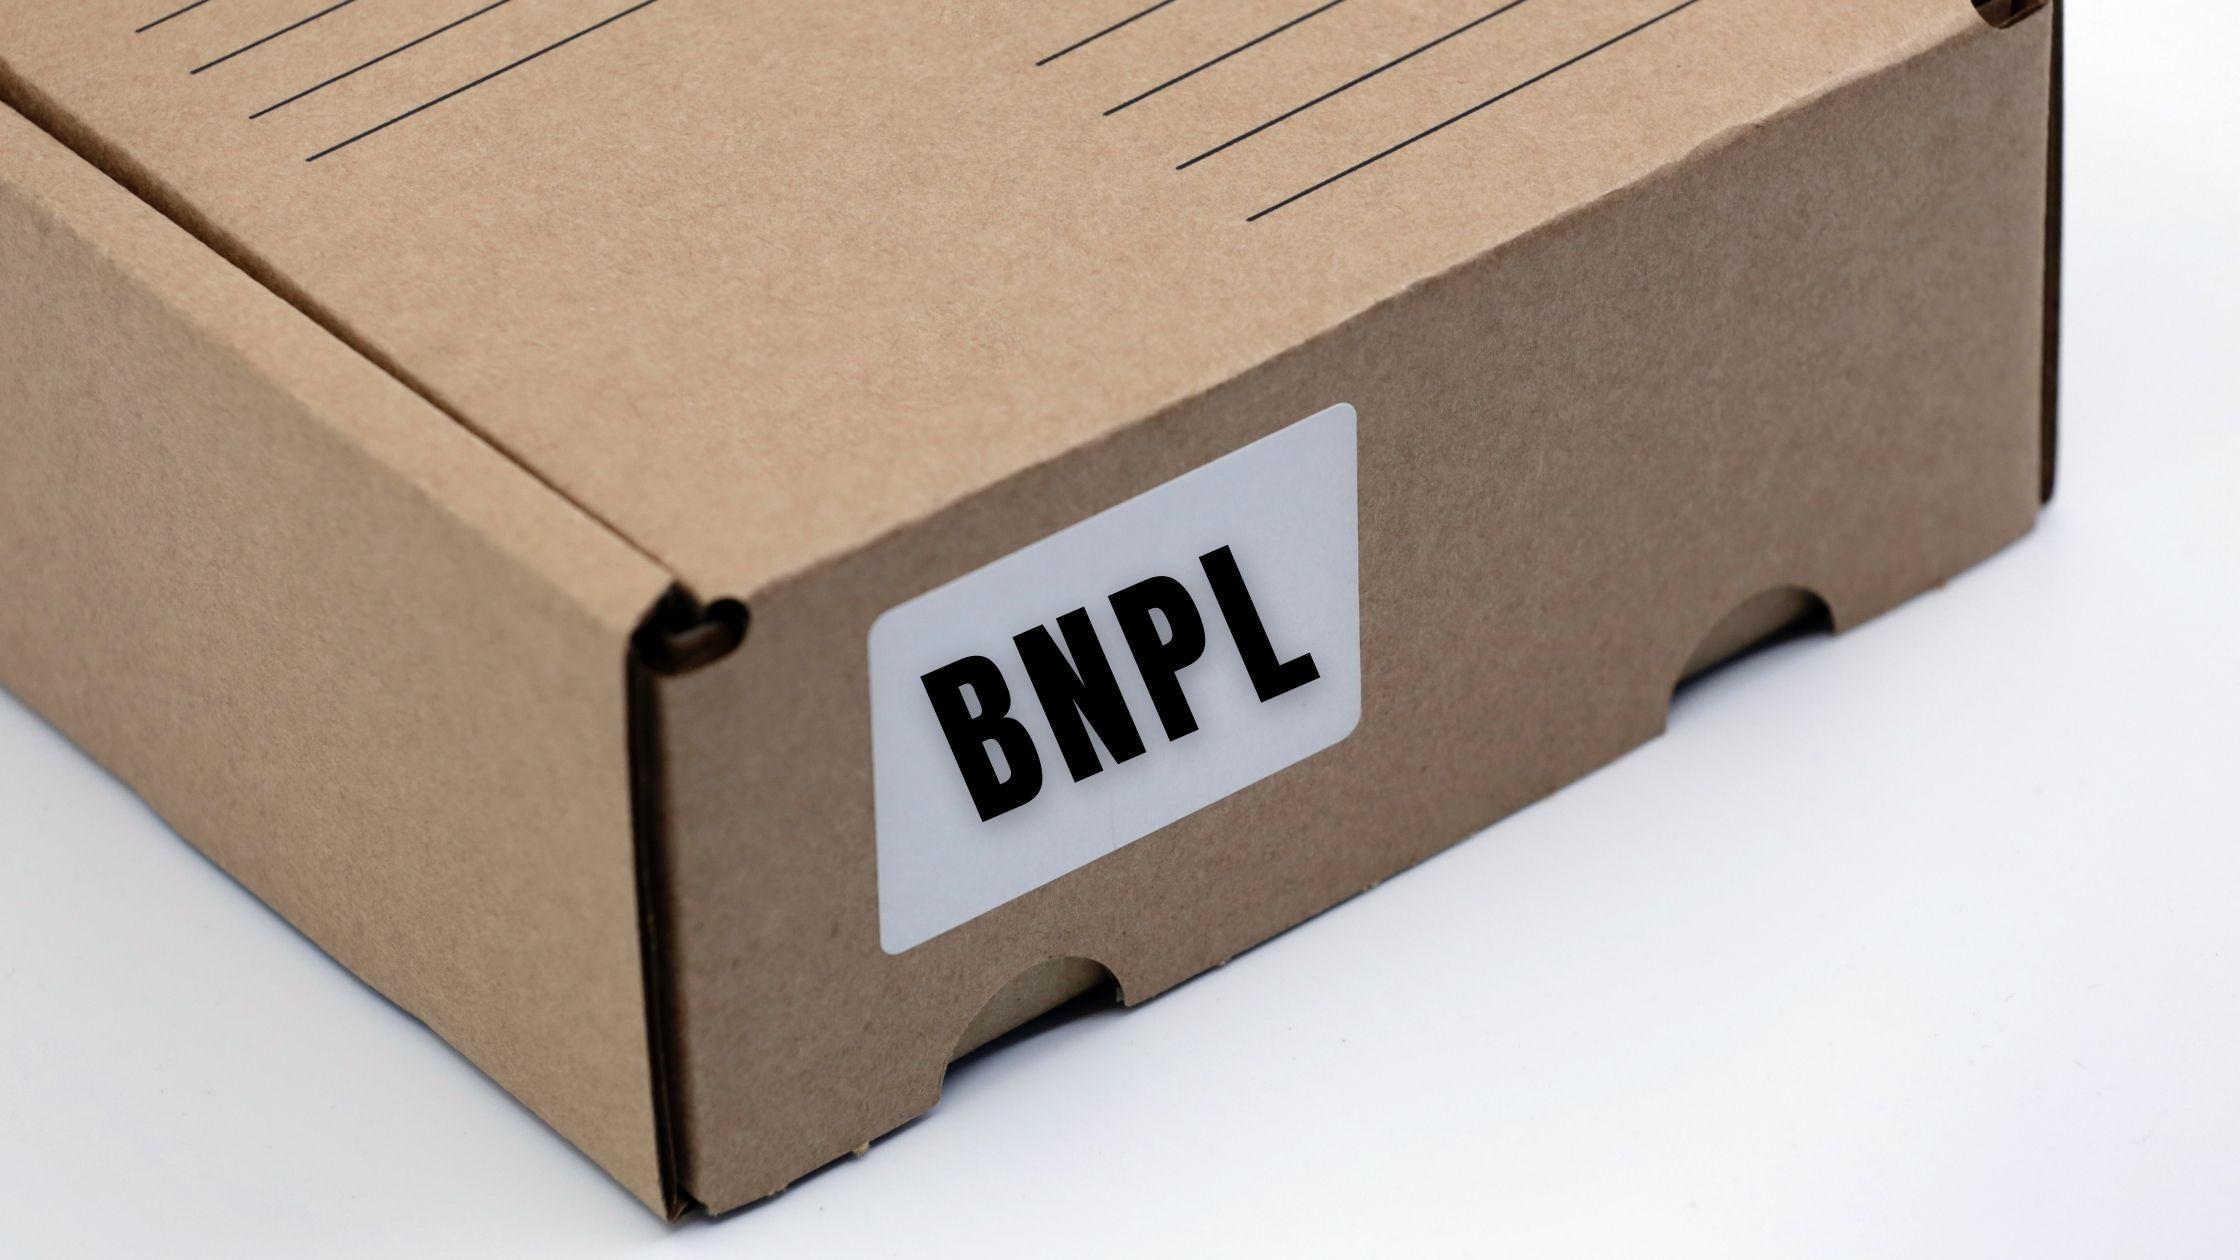 【Amazonも導入】BNPL(Buy Now Pay Later)とは?